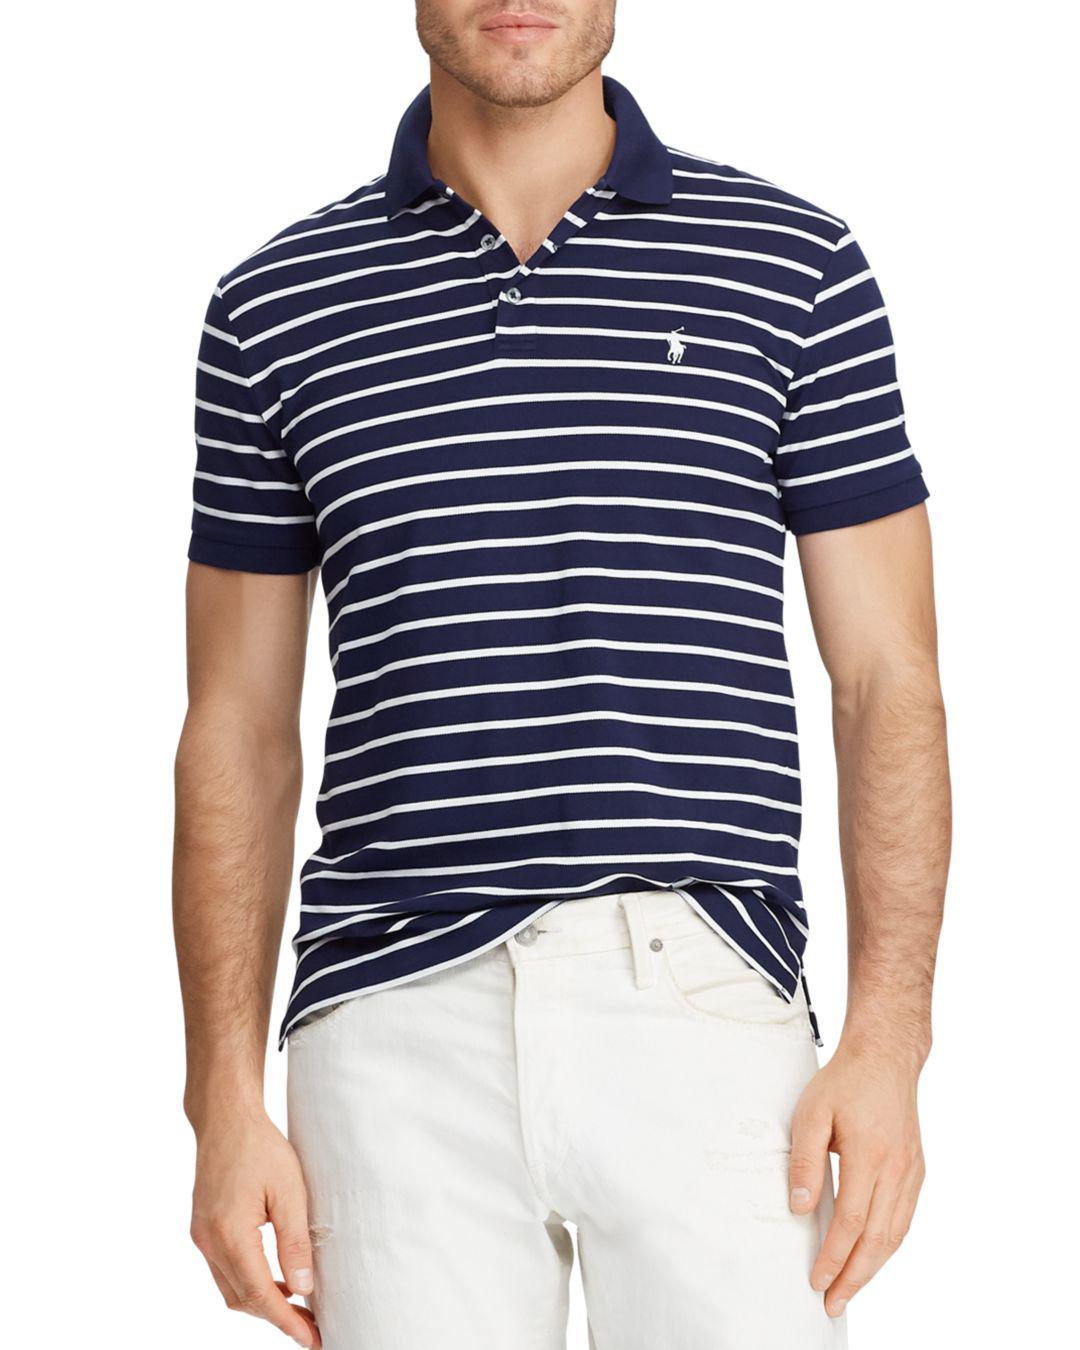 58fc45af2 Lyst - Polo Ralph Lauren Mesh Custom Slim Fit Polo Shirt in Blue for Men